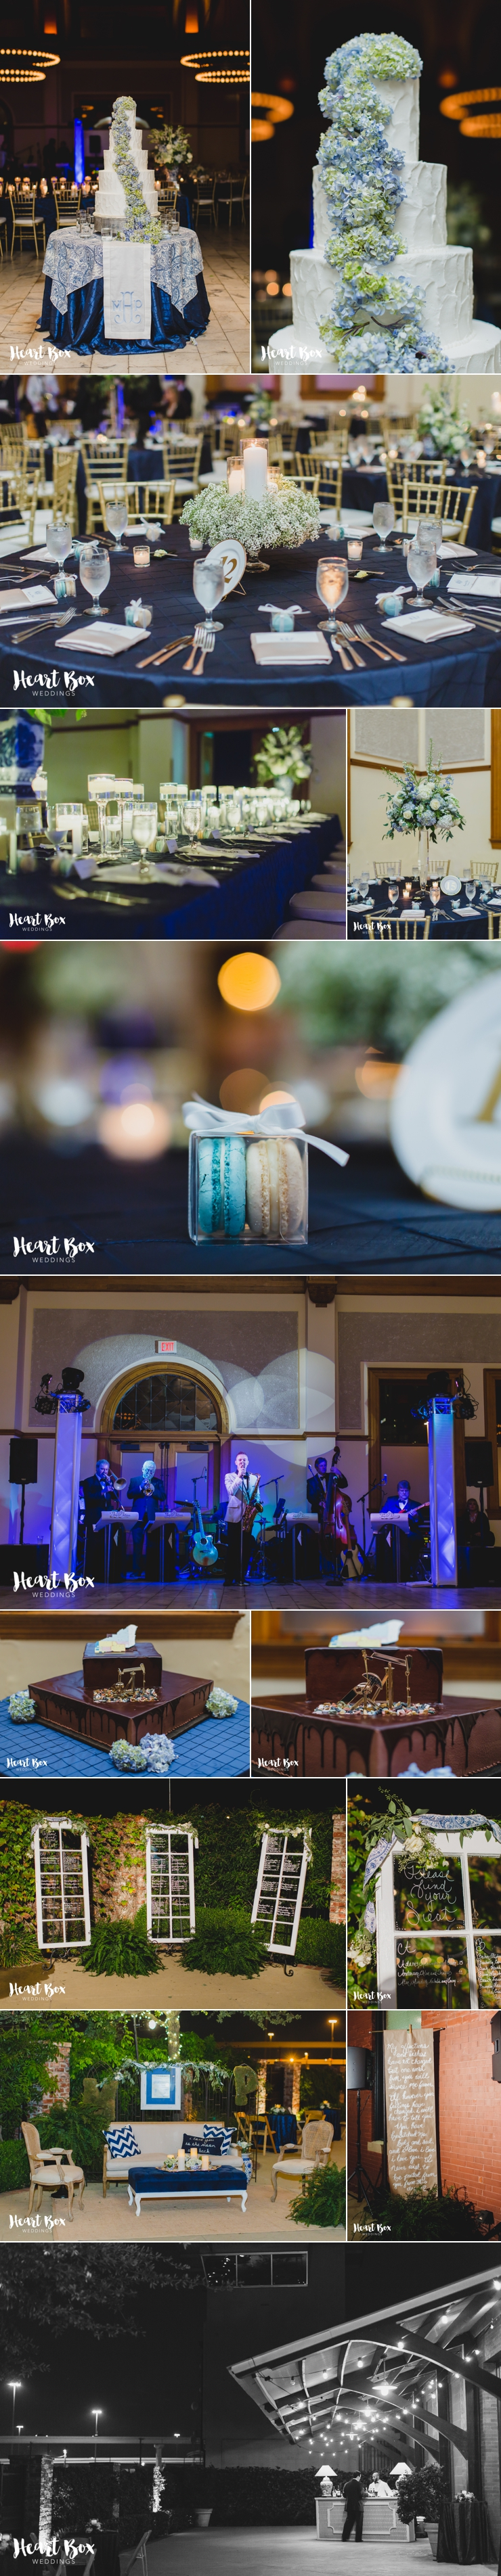 Anthony Wedding Blog Collages 16.jpg